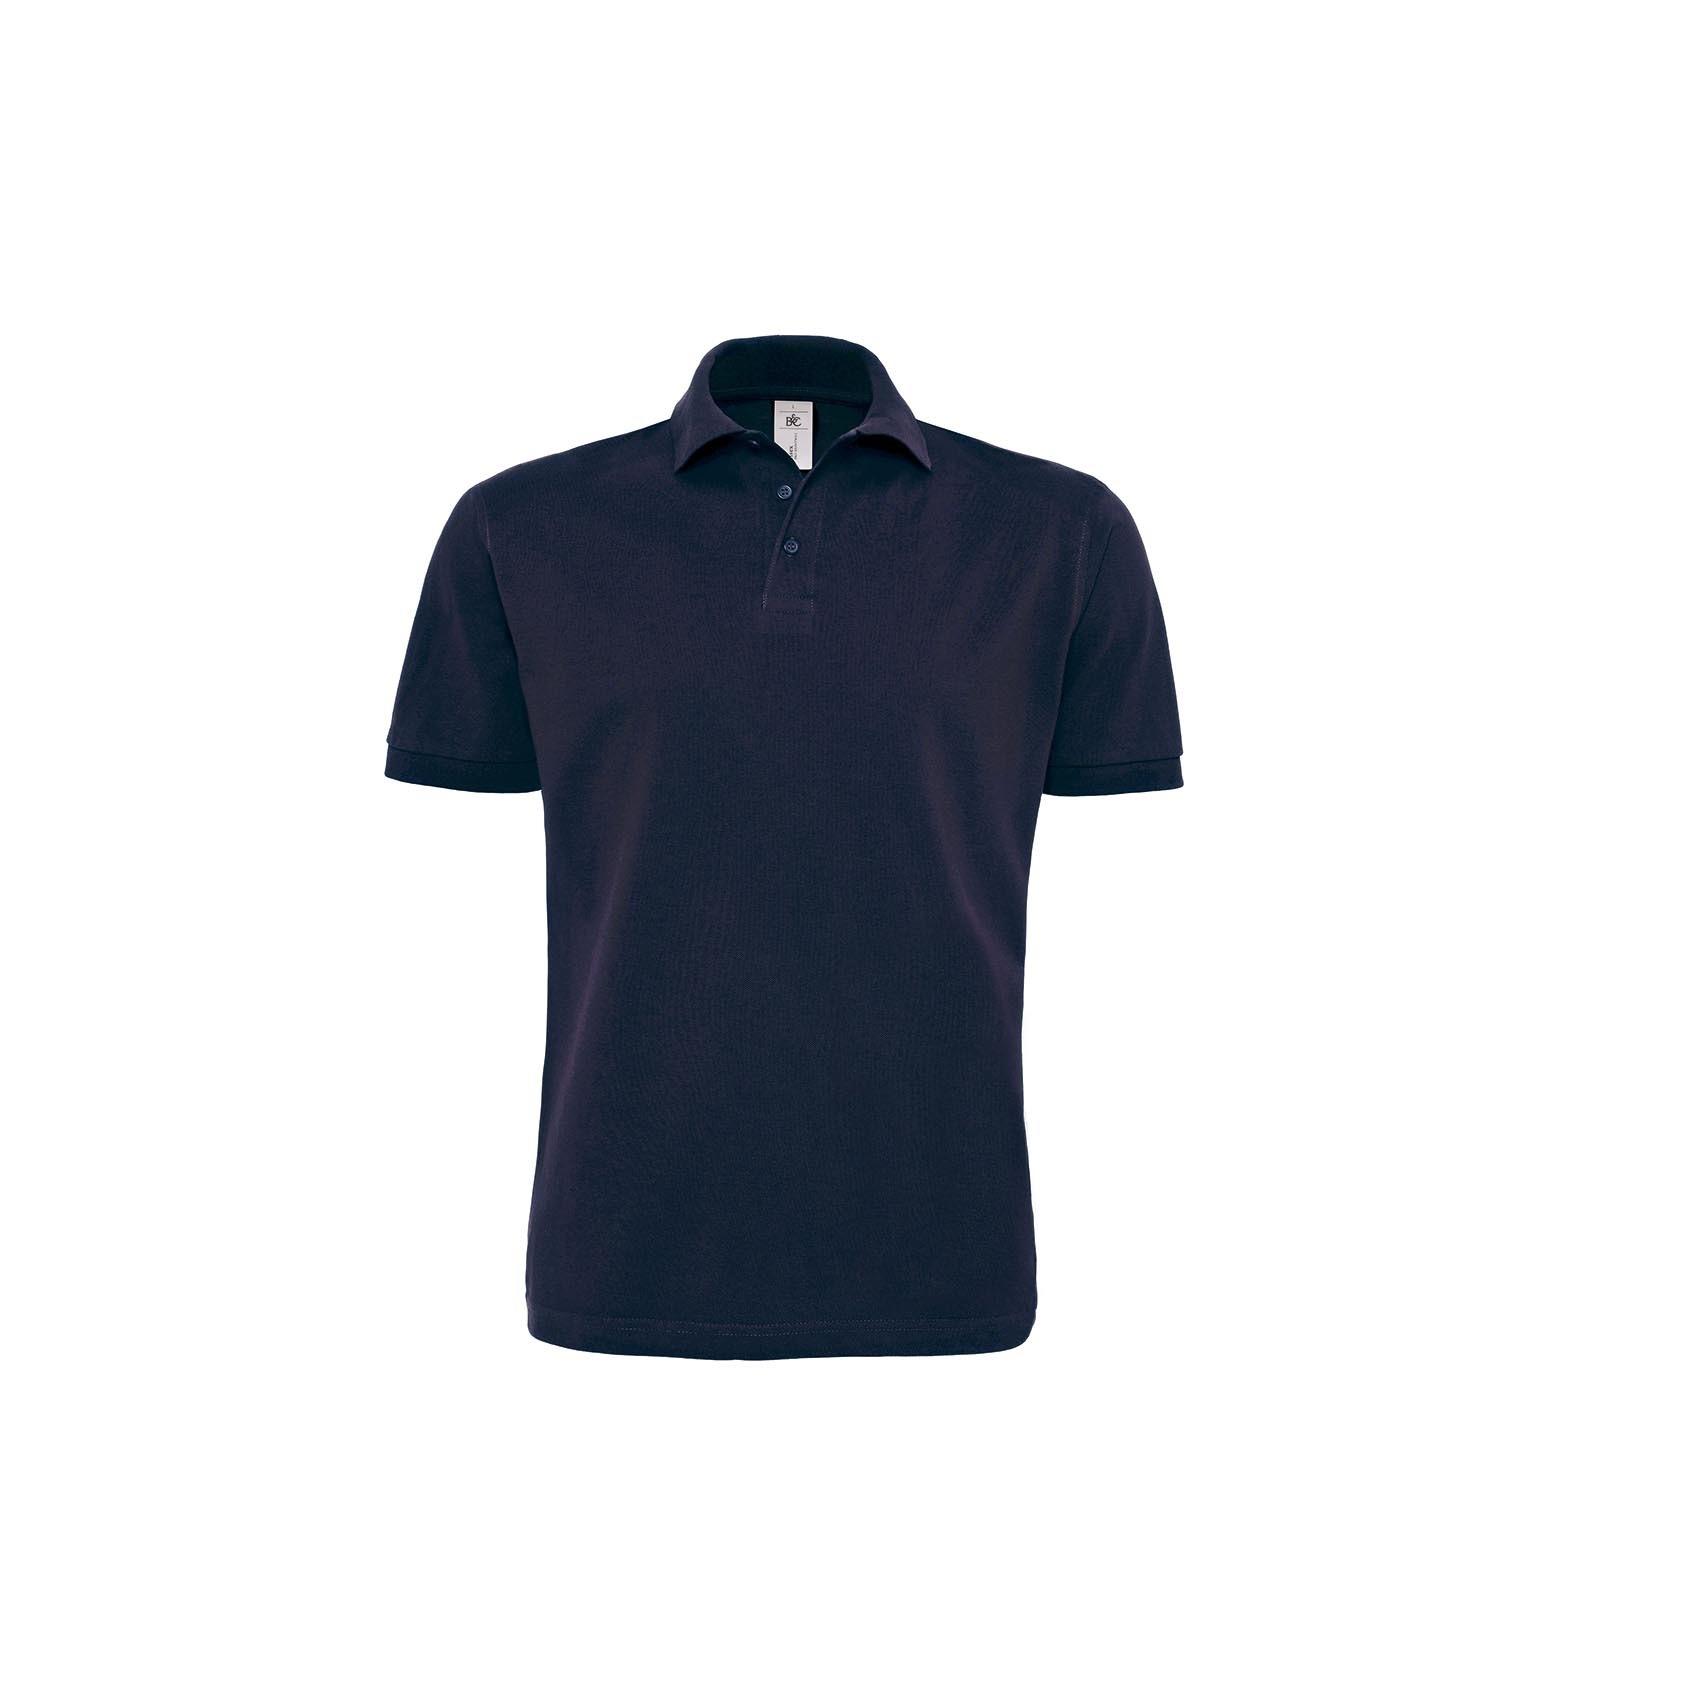 B/&C Heavymill Longsleeve Unisex Langarrm Herren Polo Shirt  Gr S bis 2XL